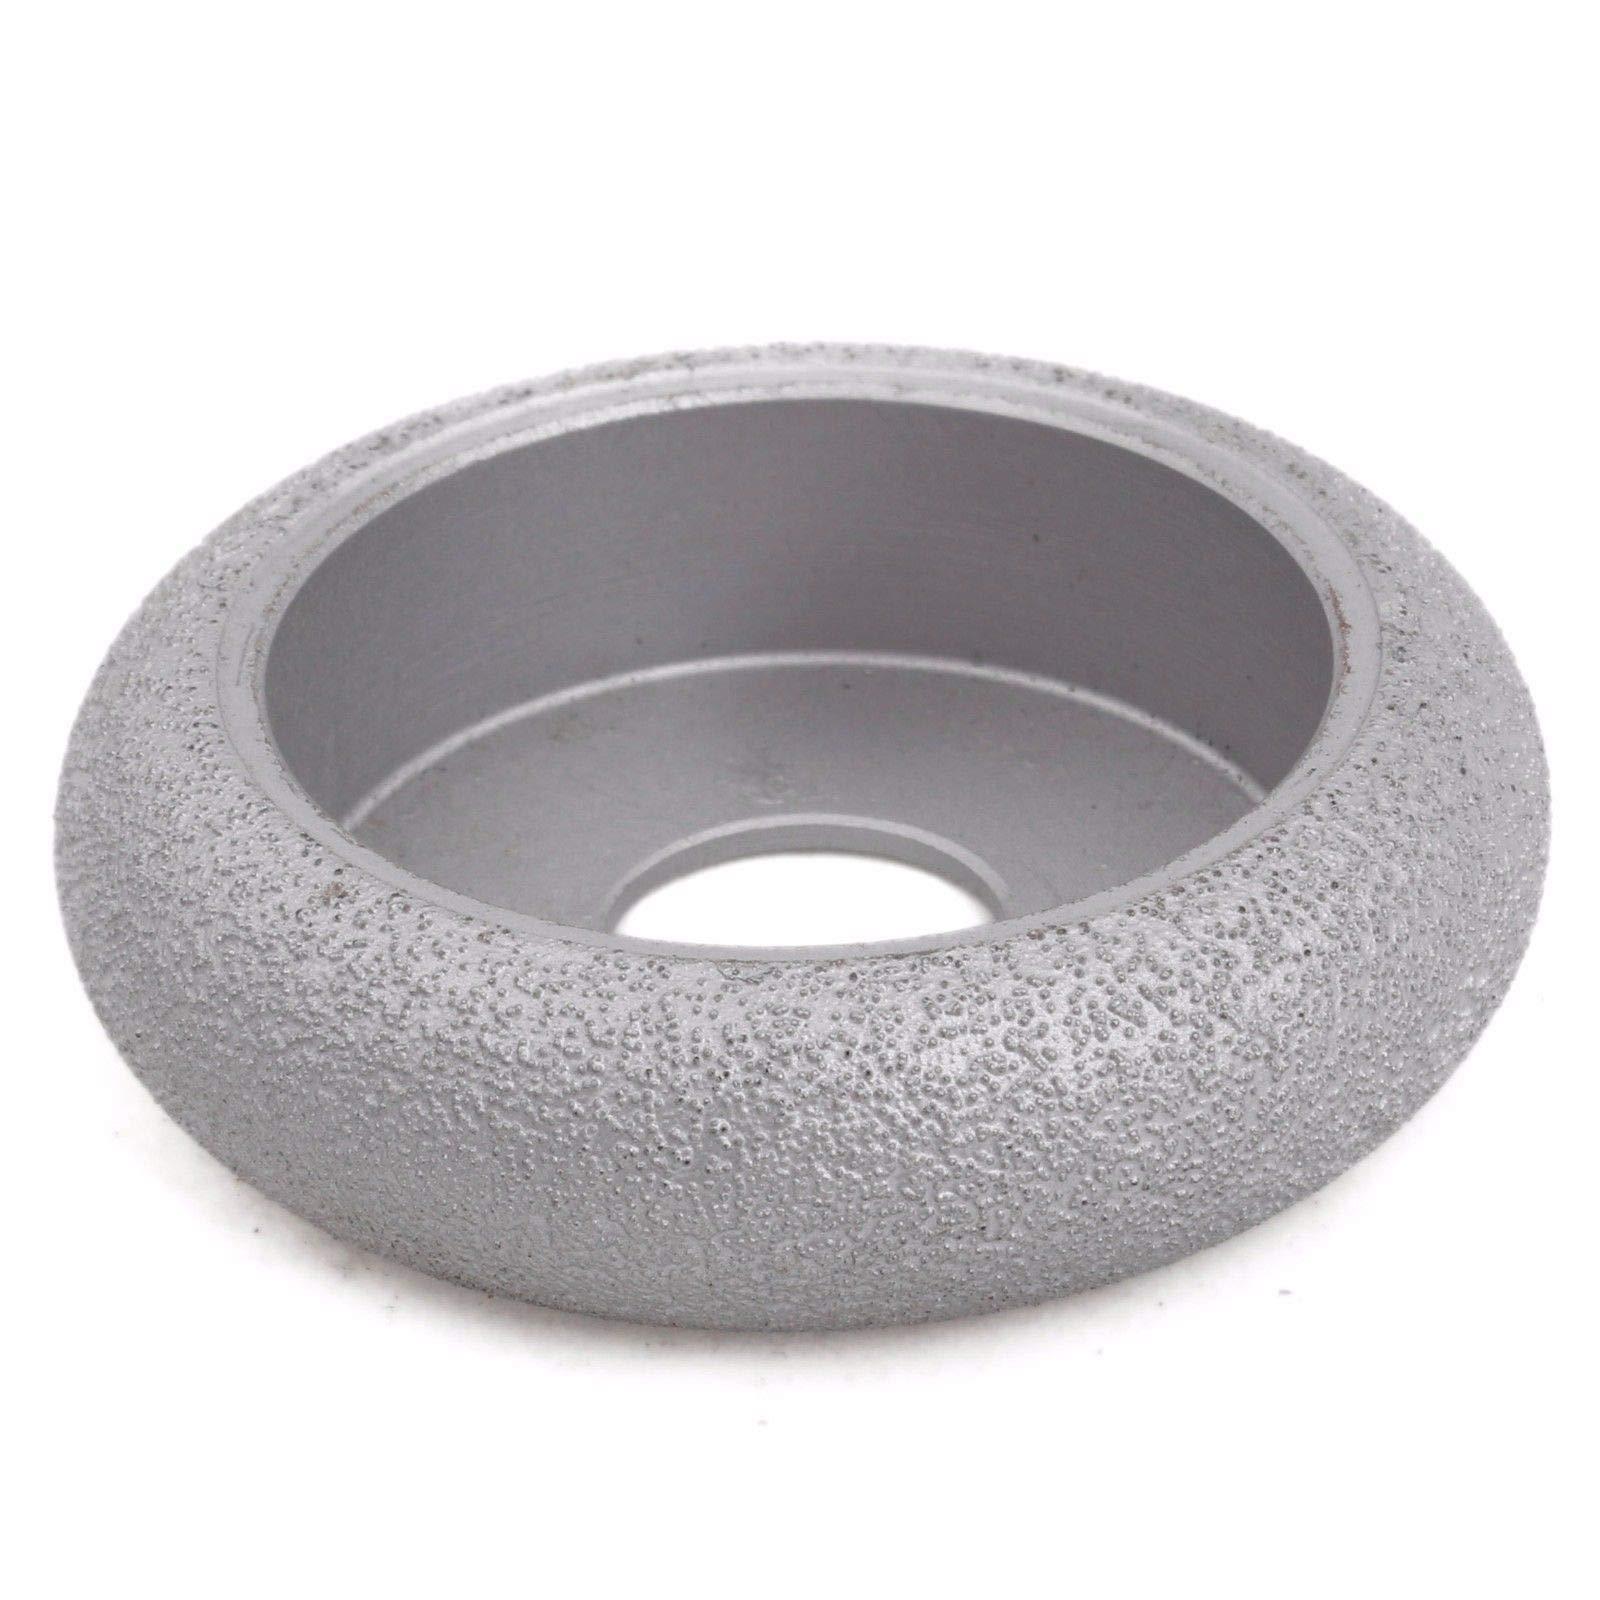 Maslin 3'' inch Grit 60 Width 25 mm Diamond Grinding Wheel Convex Curve BRAZED for Stone ILOVETOOL